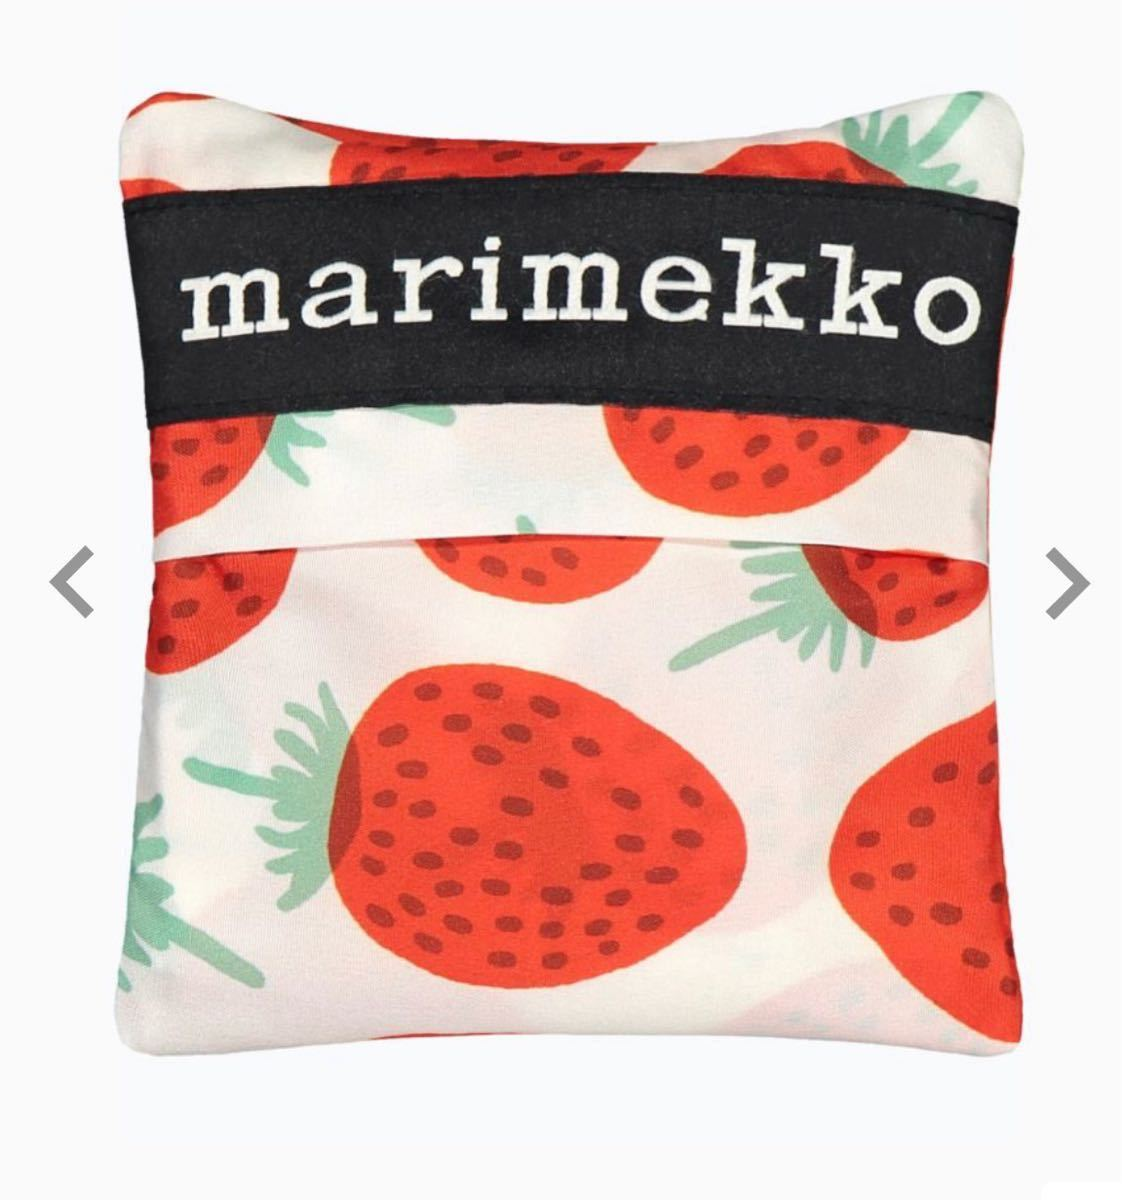 marimekko マリメッコ 新発売マンシッカ スマートバッグ2種 新品送料込_画像5